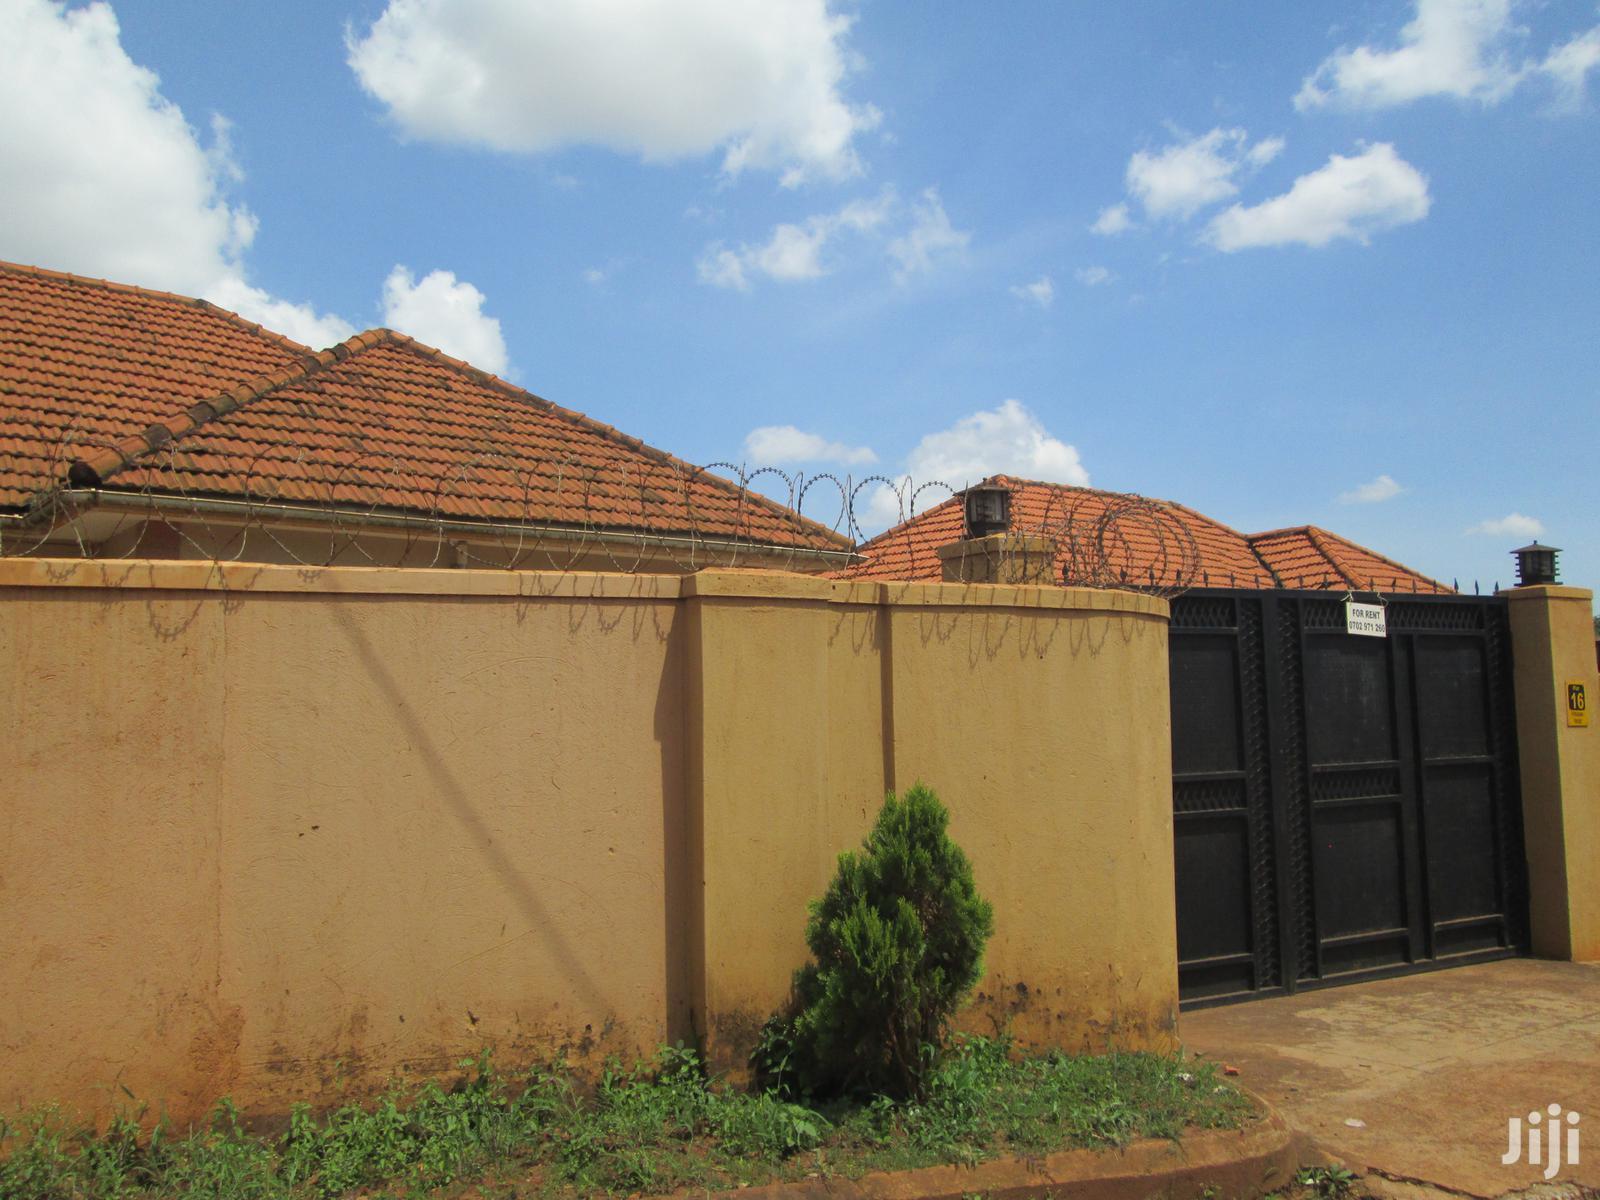 Four Bedroom House In Kirinya Along Bukasa Road For Rent | Houses & Apartments For Rent for sale in Kampala, Central Region, Uganda